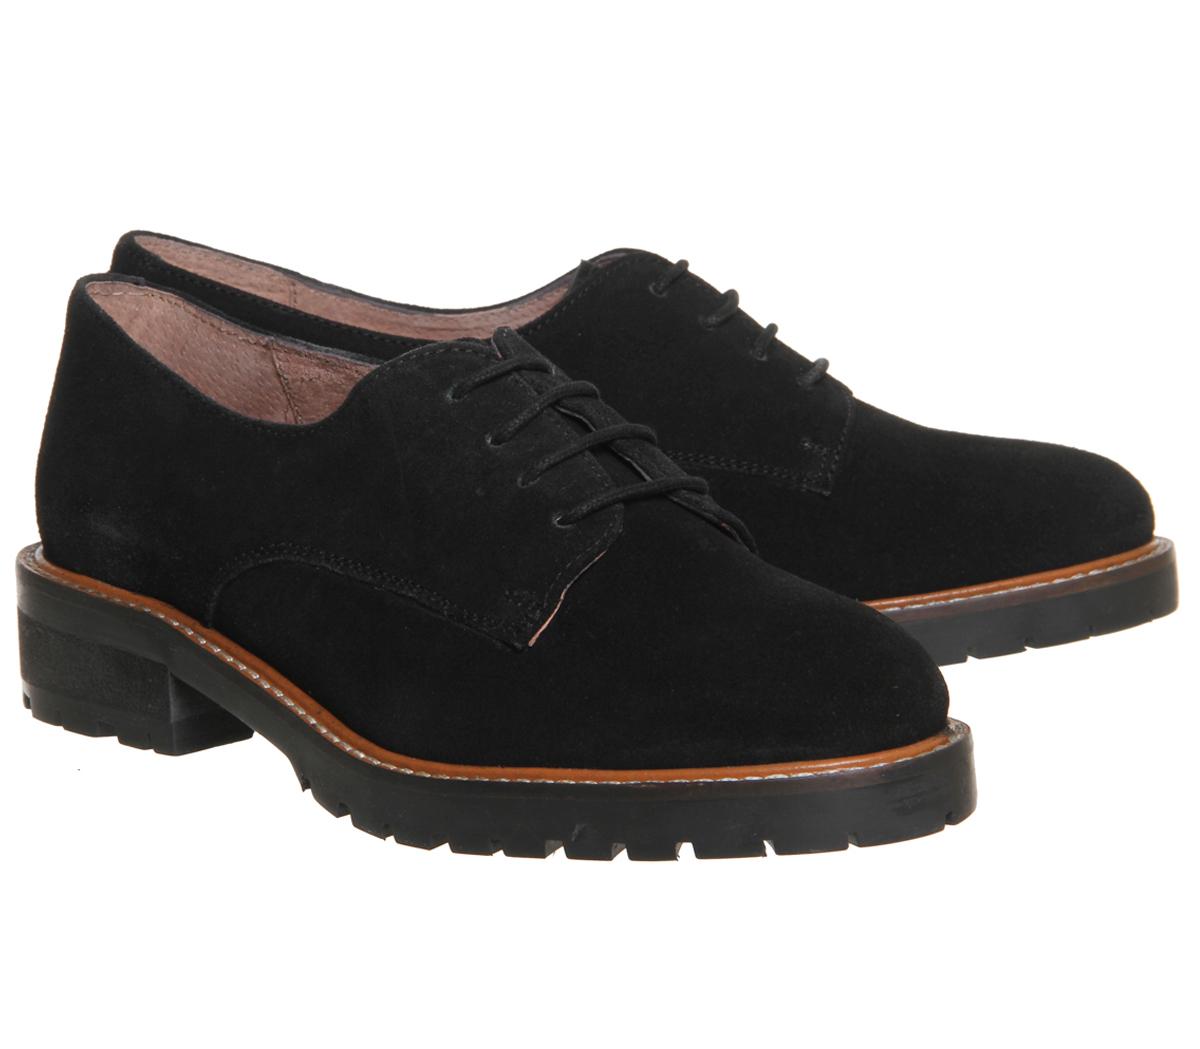 Damenschuhe SUEDE Office Kennedy Lace up Schuhes BLACK SUEDE Damenschuhe Flats 3a4672